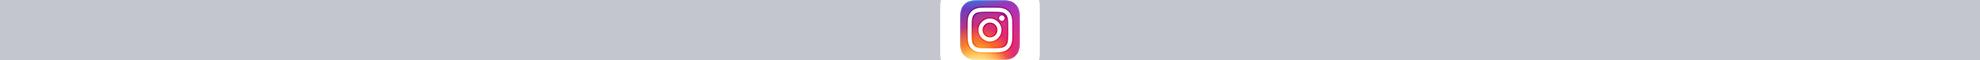 Instagram-icon-1980.jpg